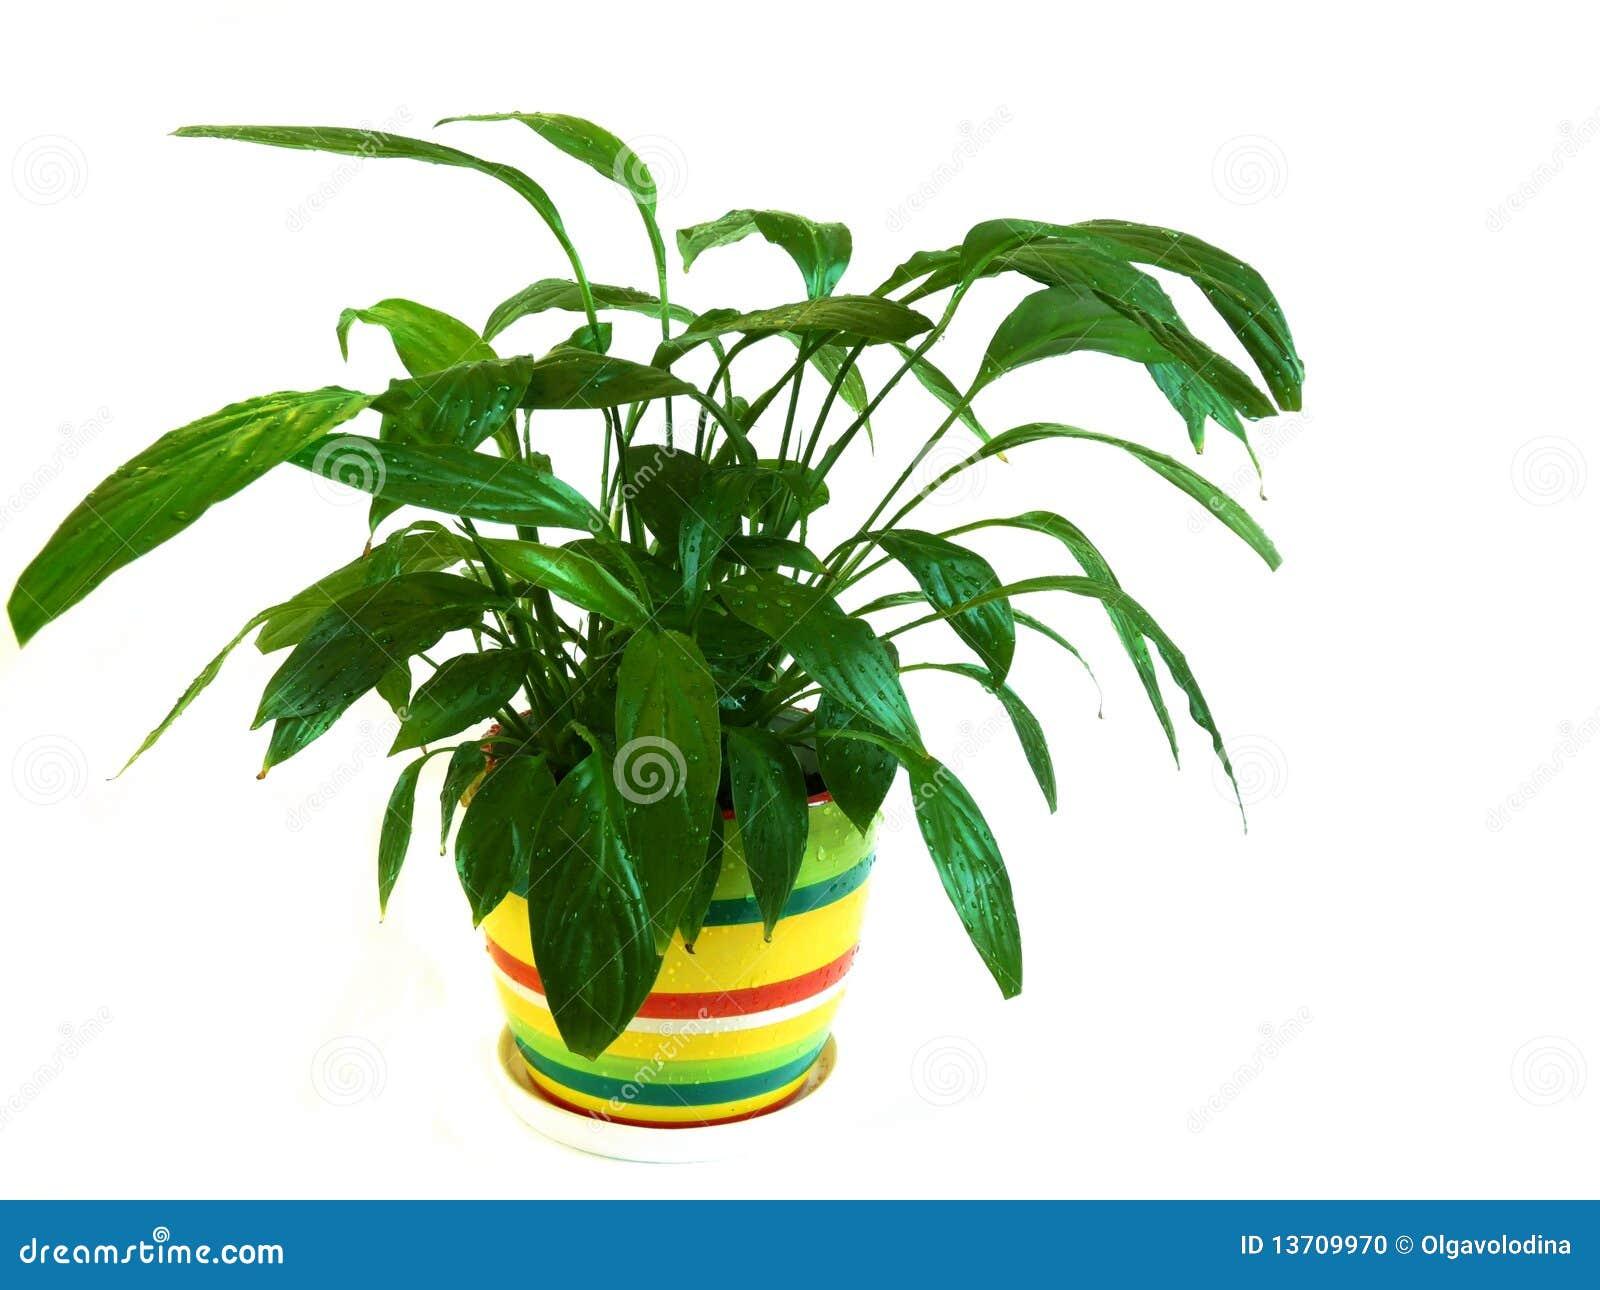 Спатифиллум с зелеными цветами фото